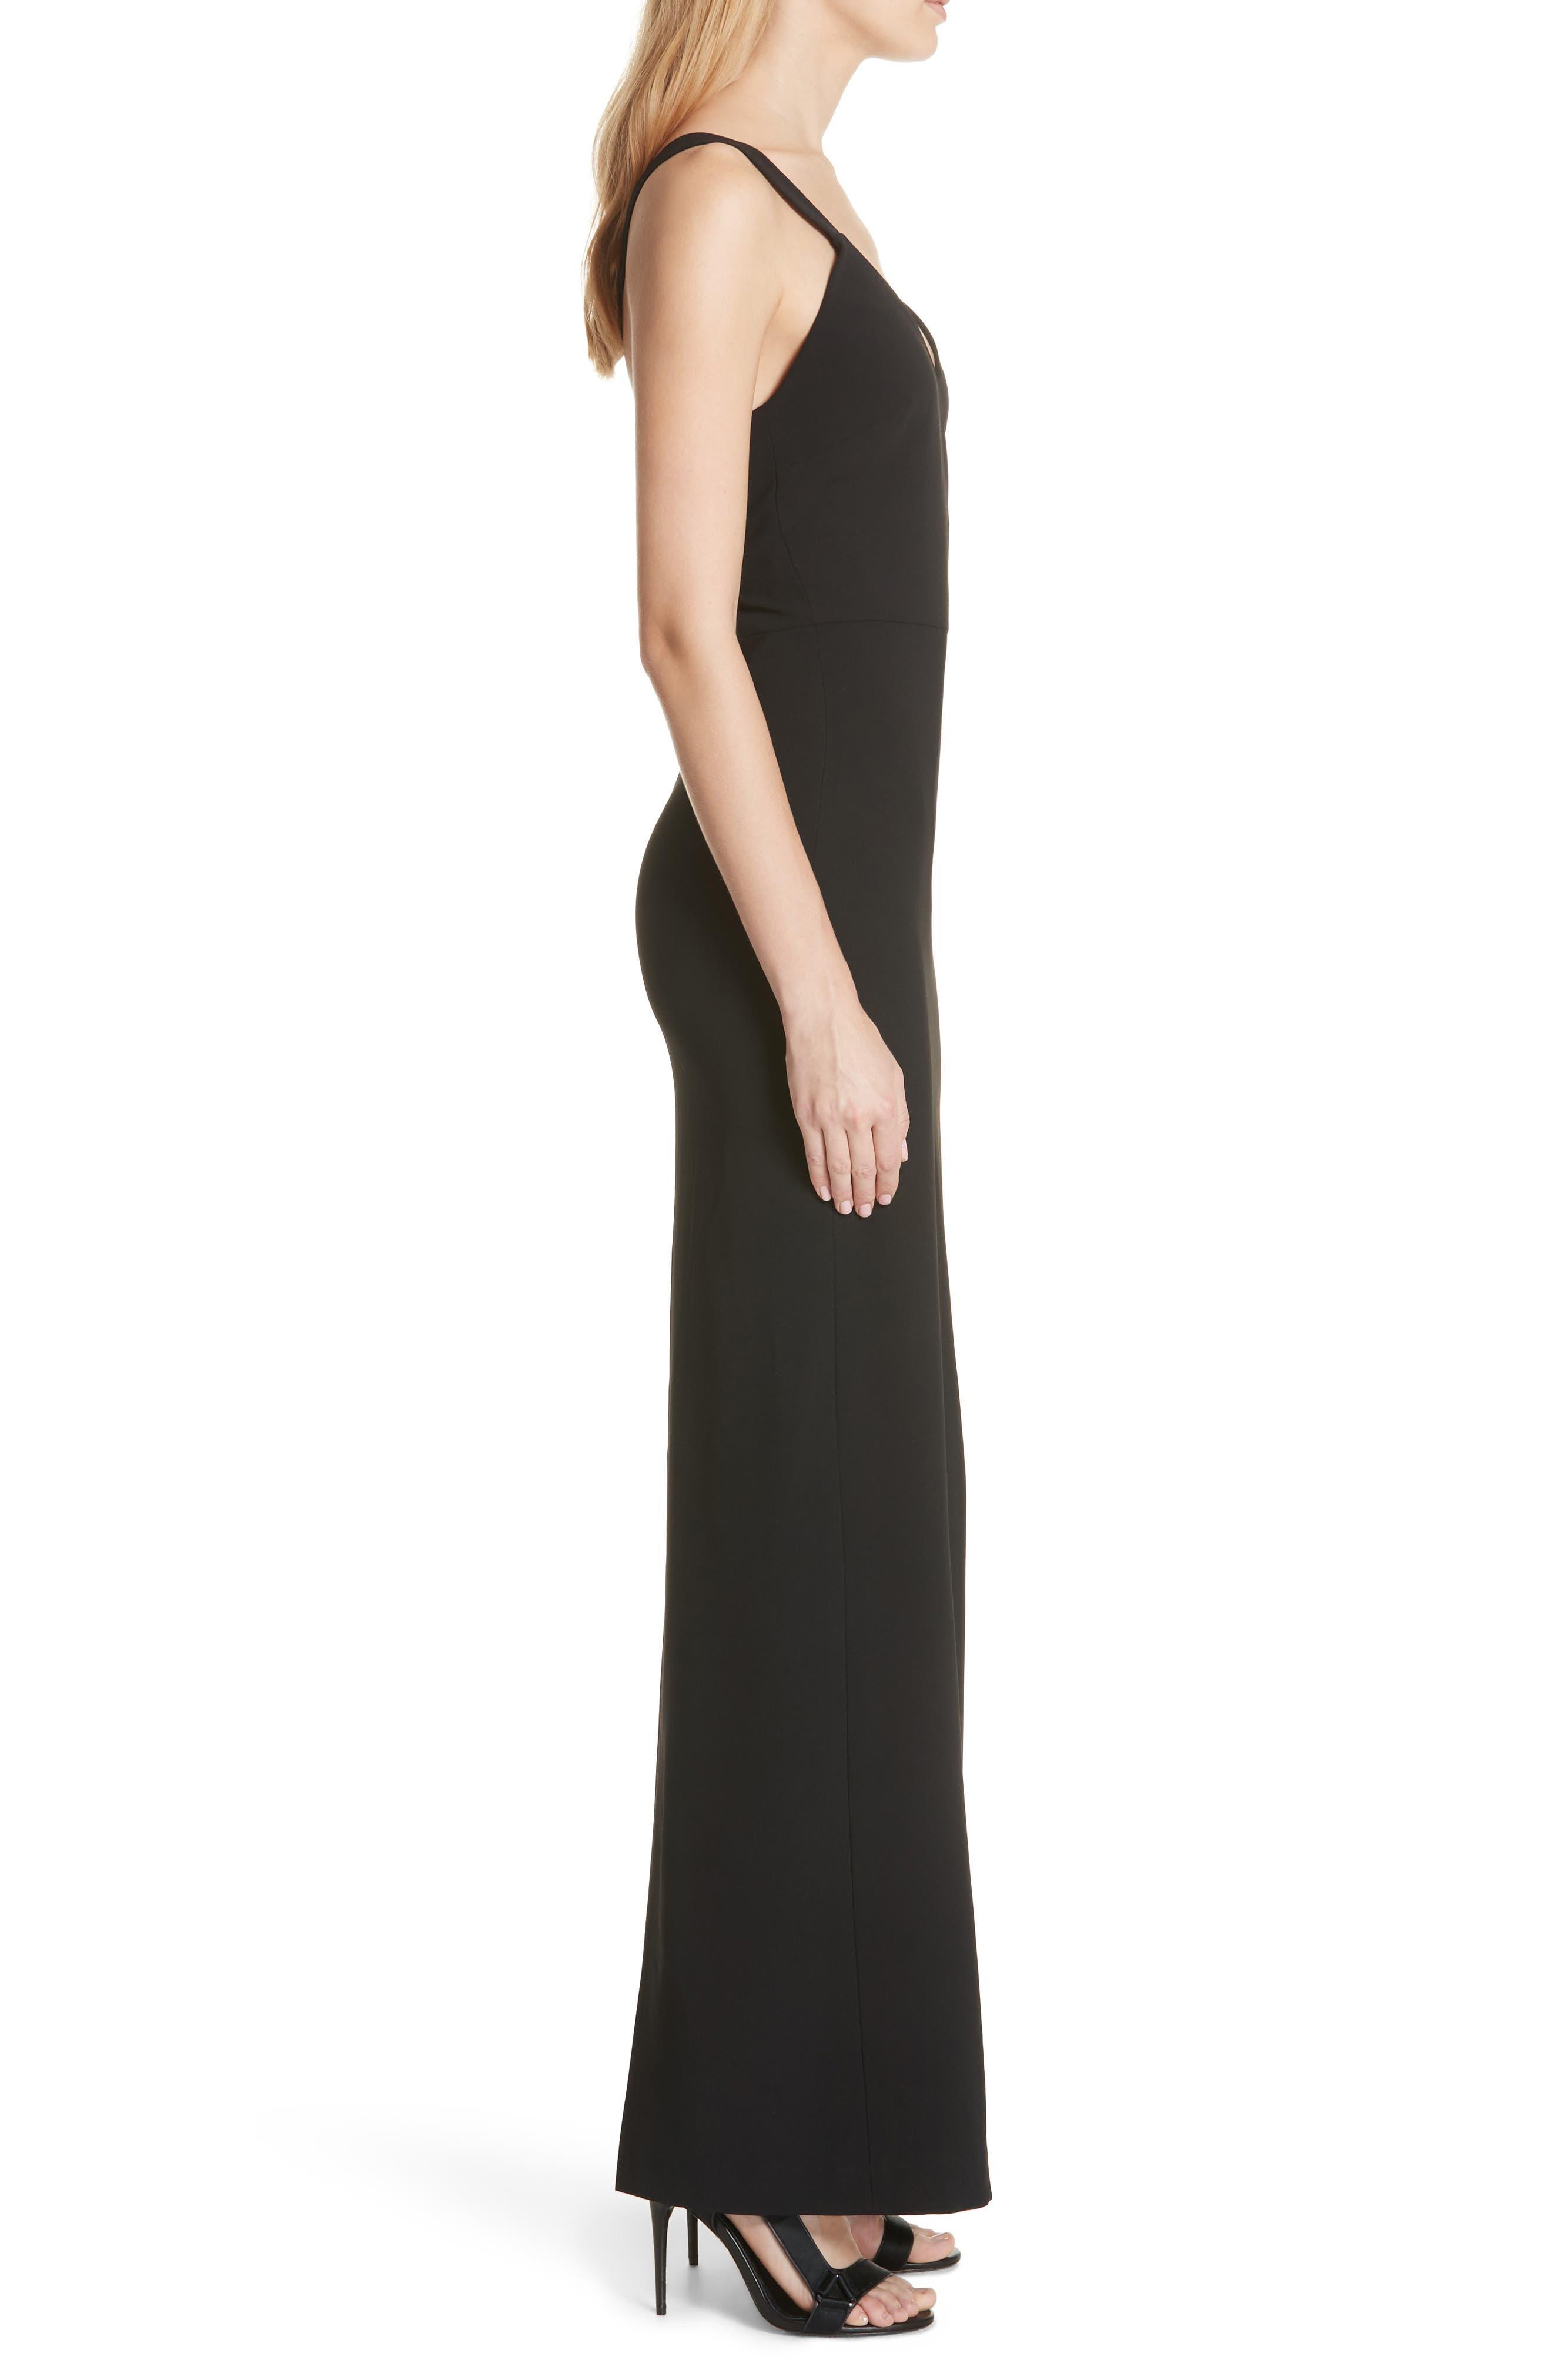 Brianna Strappy Back Maxi Dress,                             Alternate thumbnail 3, color,                             Black